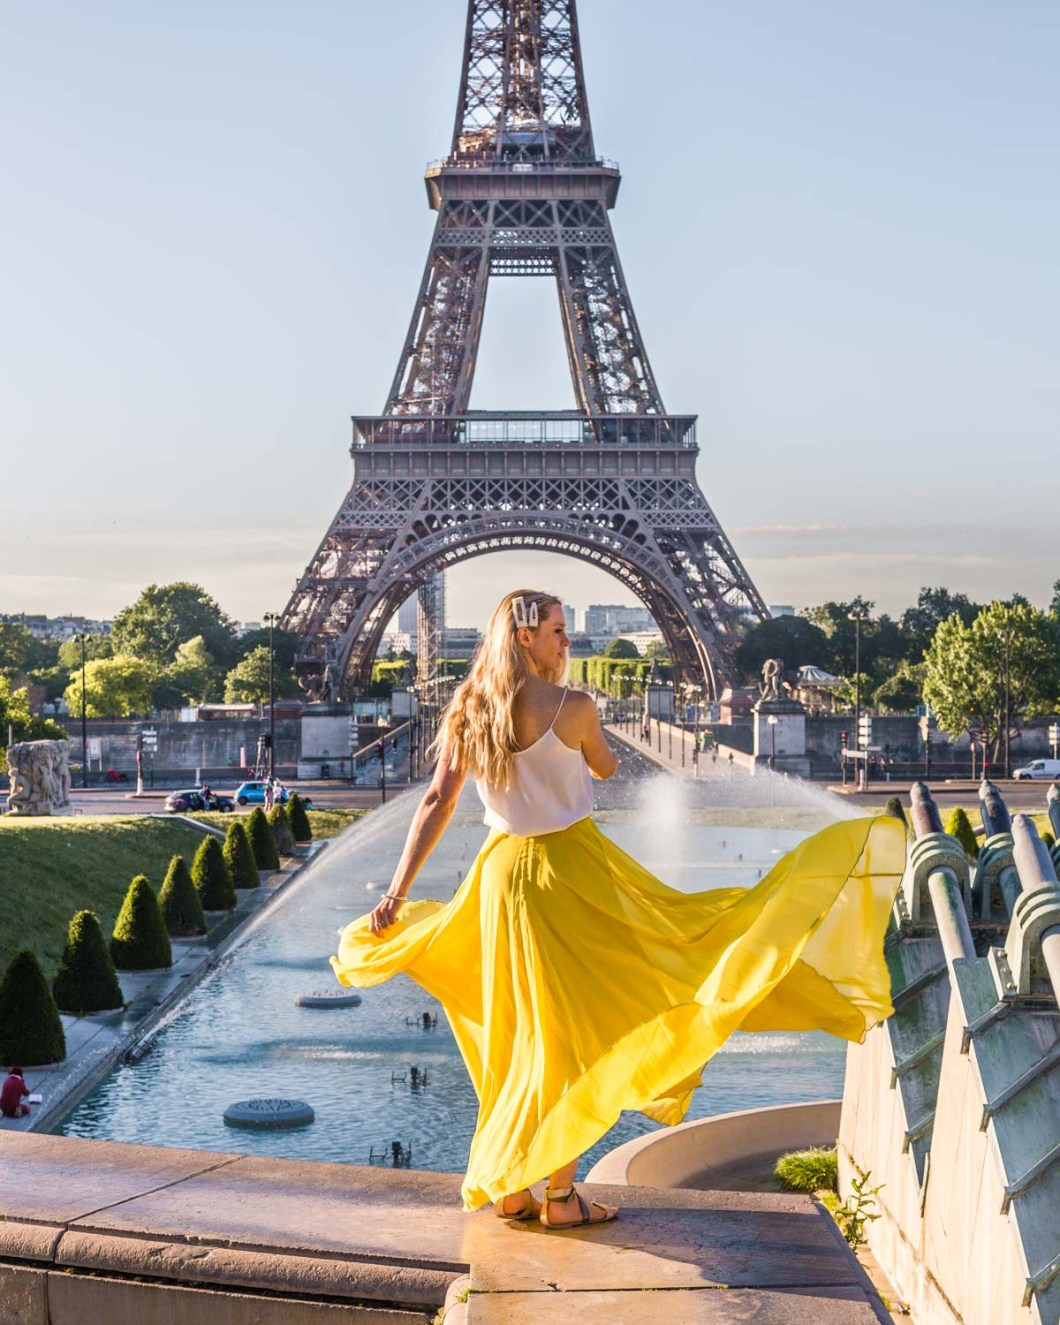 Trocadéro gardens with the Eiffel Tower